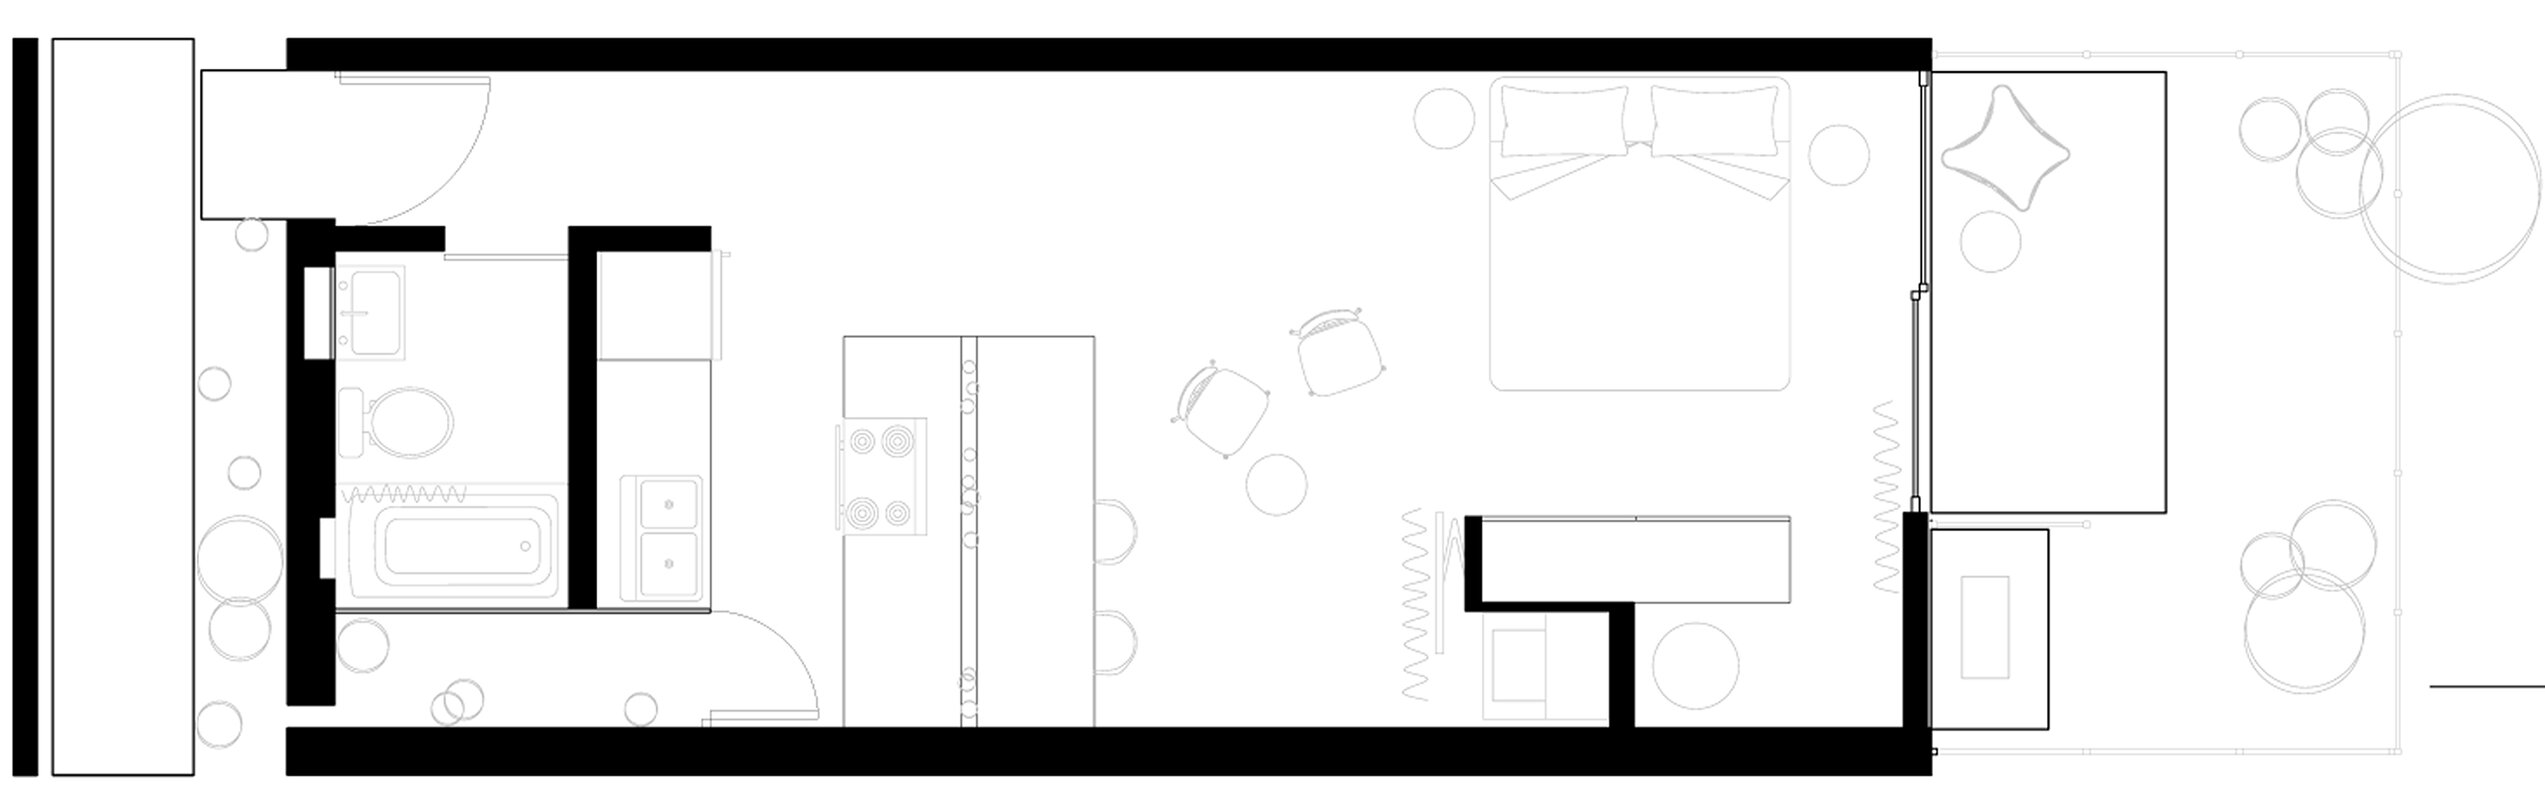 White Stone Studios - Tiny House - Benjamin Hall Design - Arizona - Floor Plan - Humble Homes